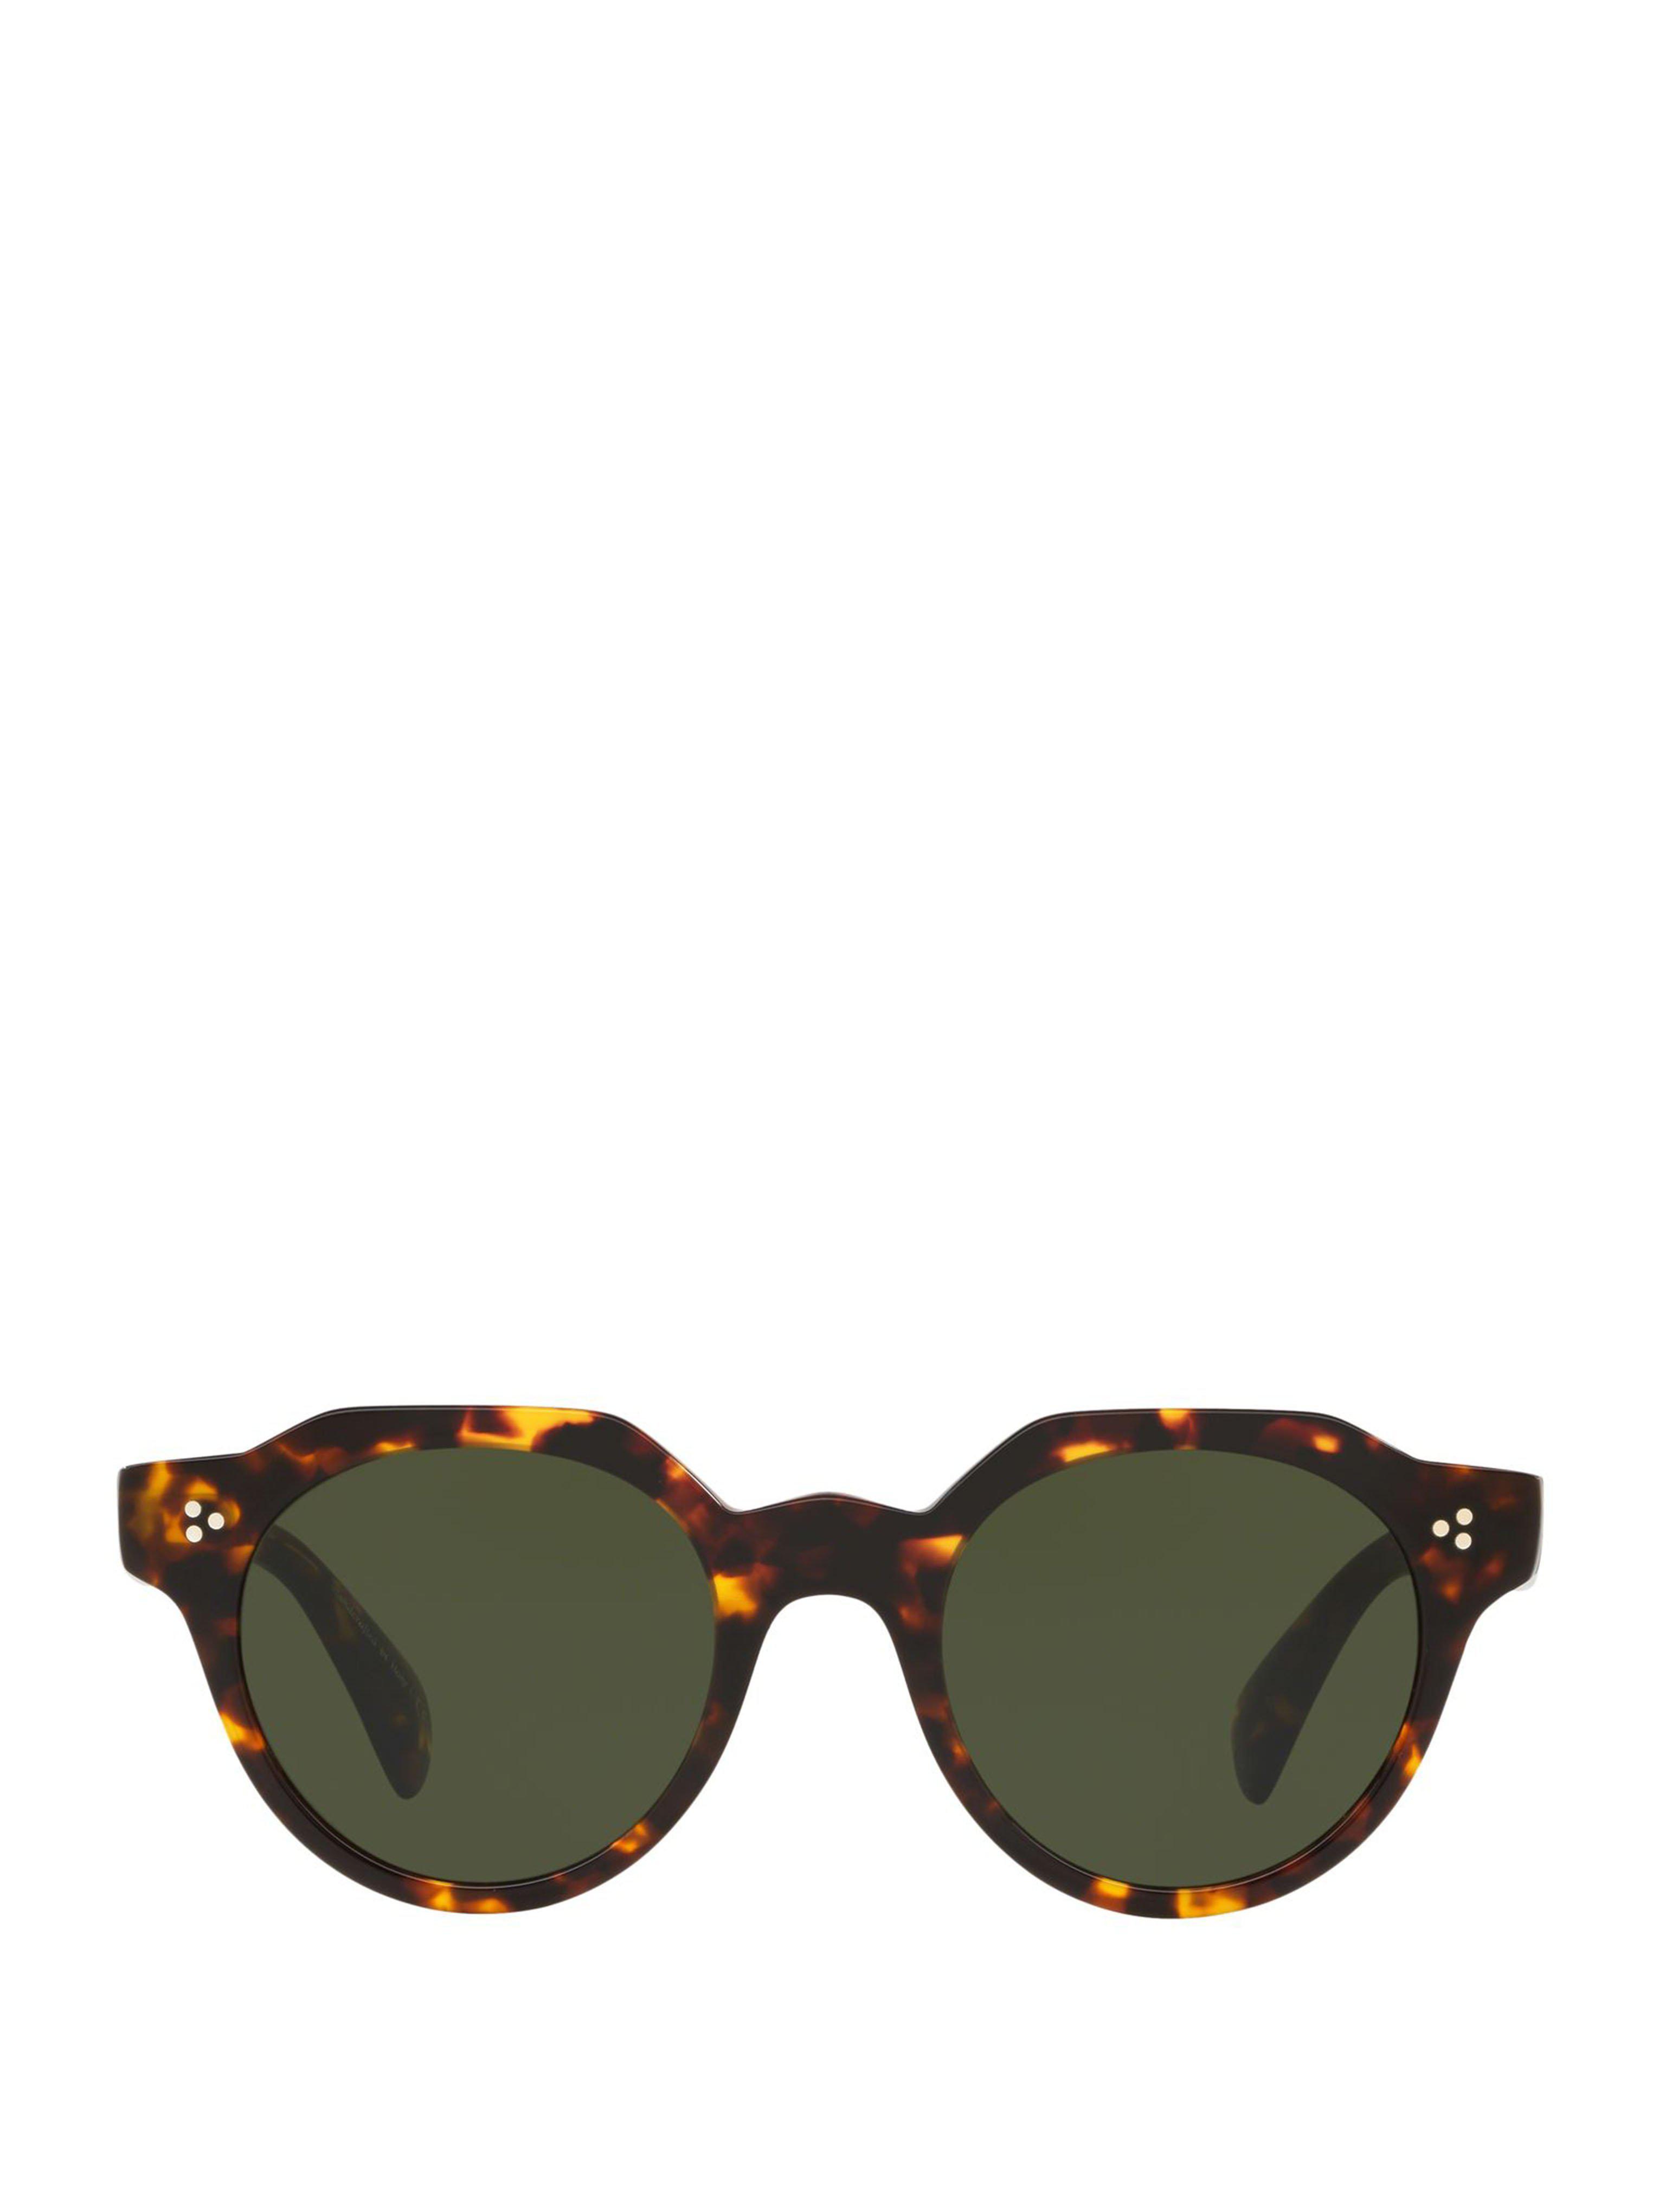 6e1313e28e5 Lyst - Oliver Peoples Irven Tortoise Round Sunglasses in Green